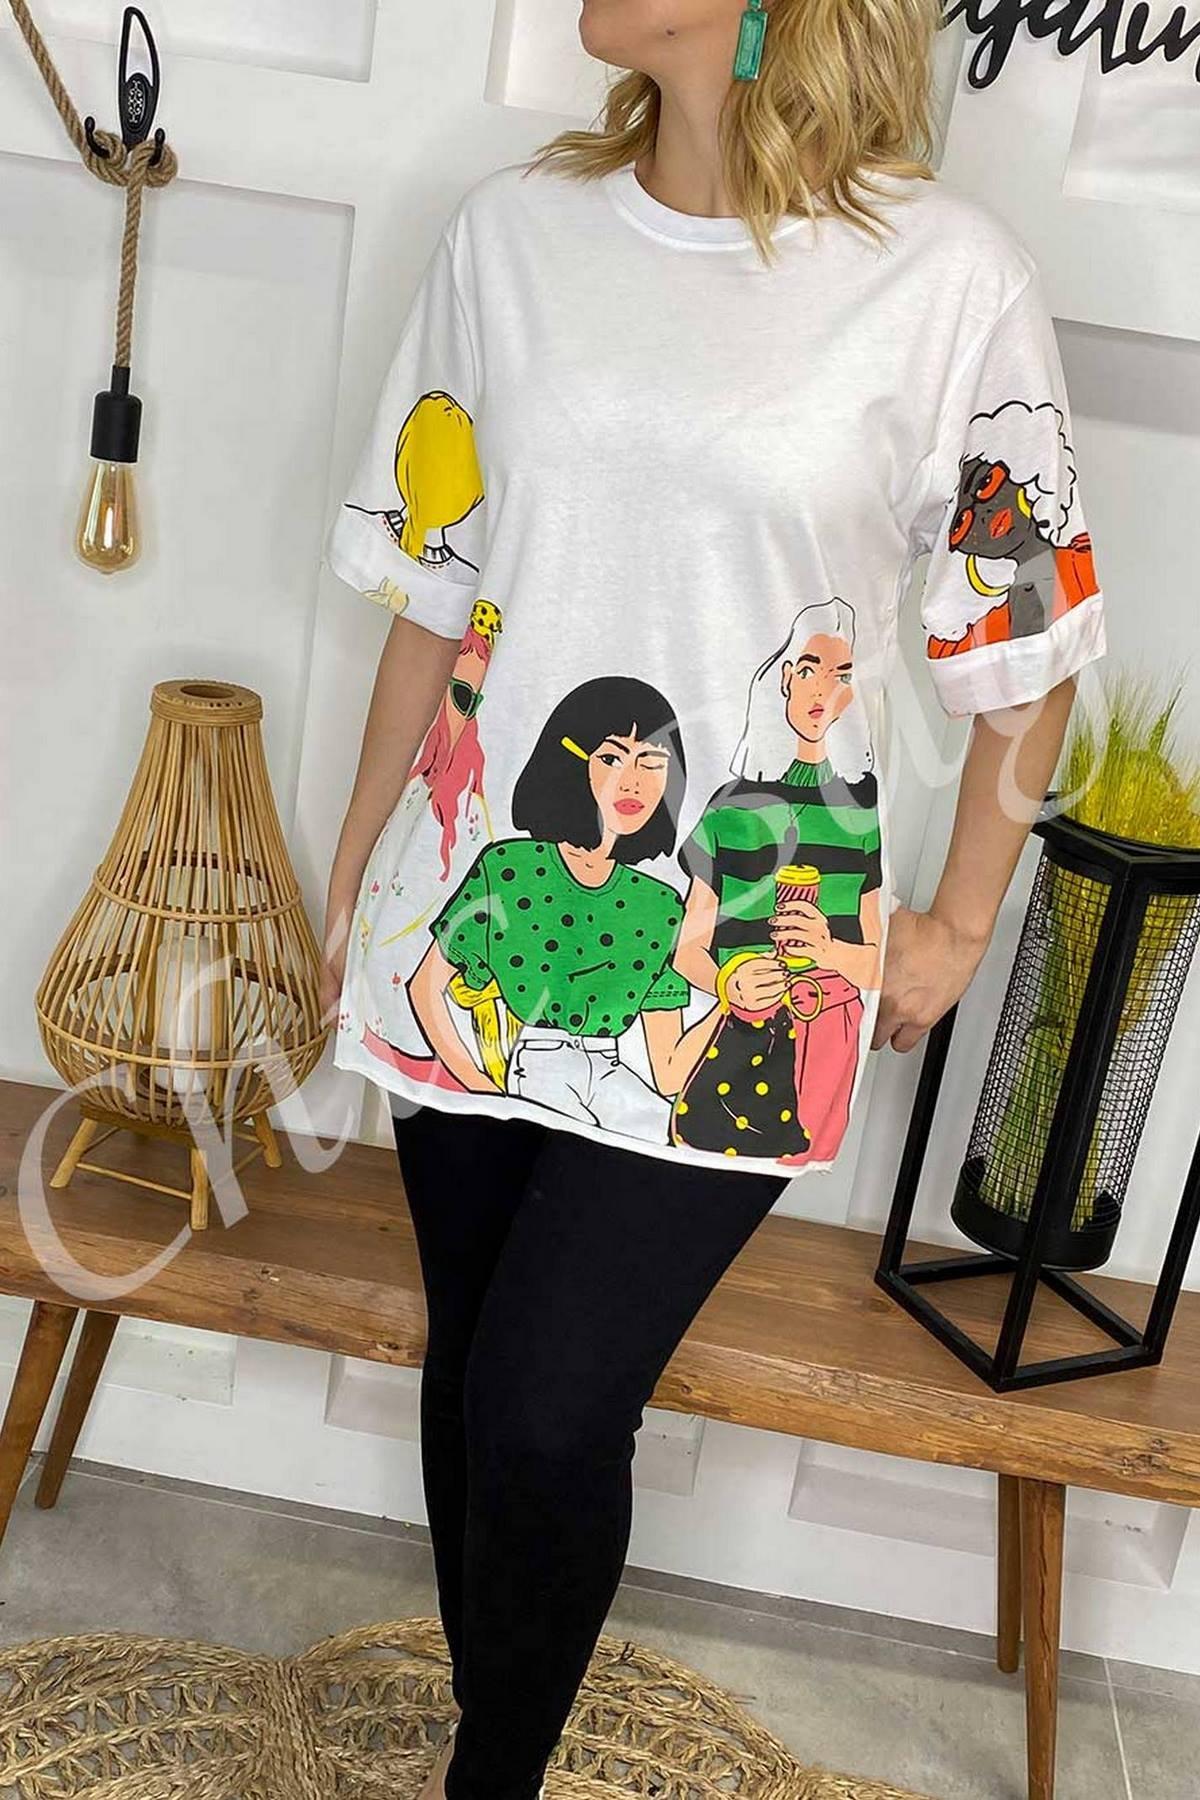 https://resim.chicbag.com.tr/p000894/byz/uc-kiz-baskili-t-shirt-orgn-01e46e348f0b.